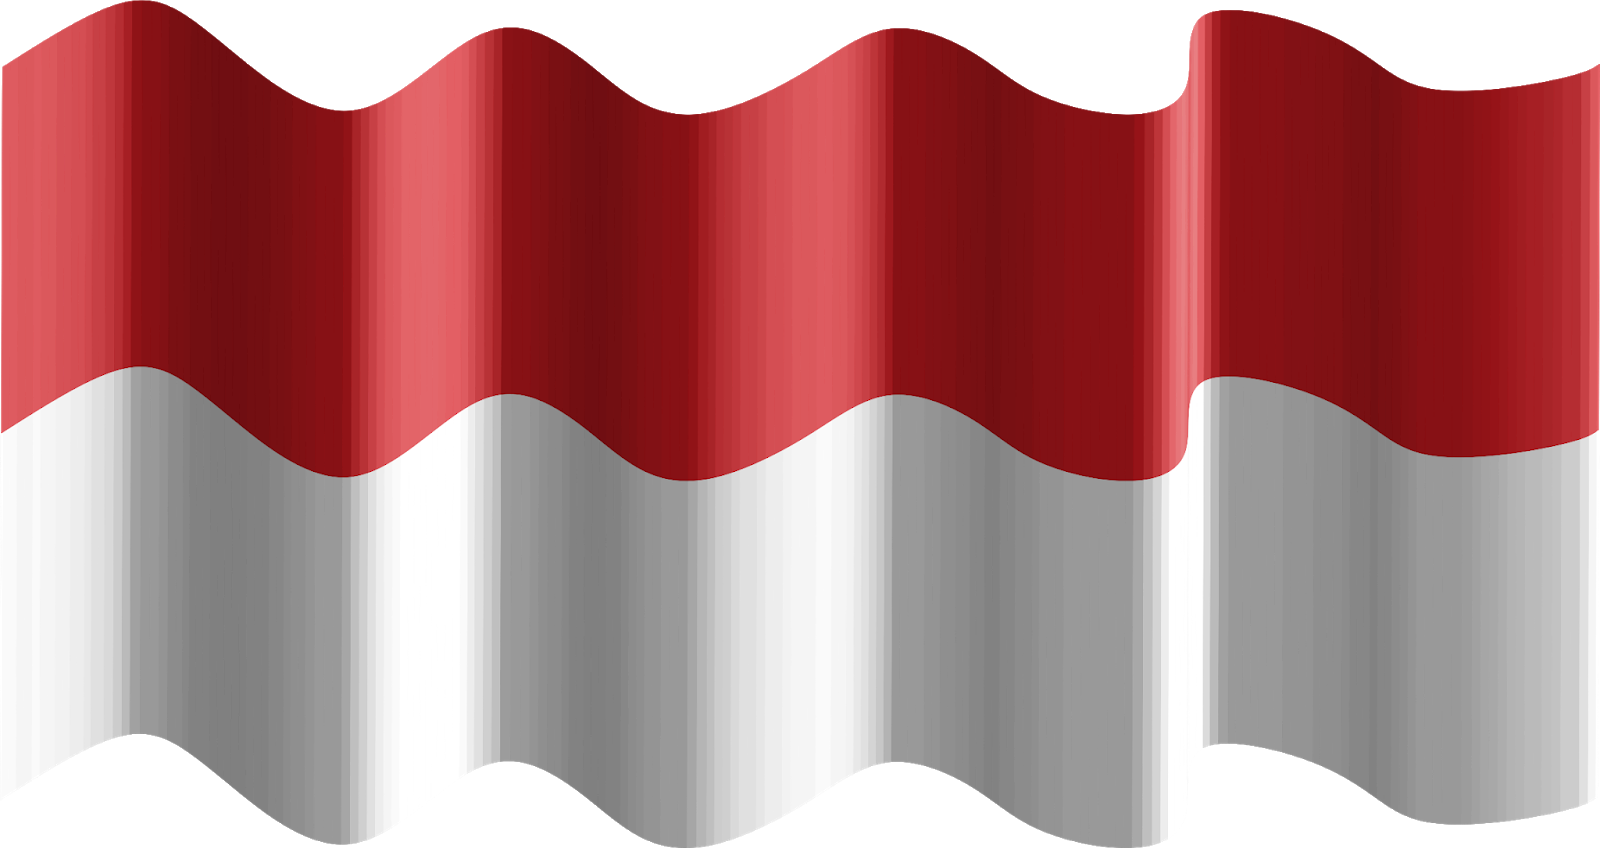 Tutorial Membuat Bendera Berkibar Menggunakan Coreldraw X7 Zotutorial